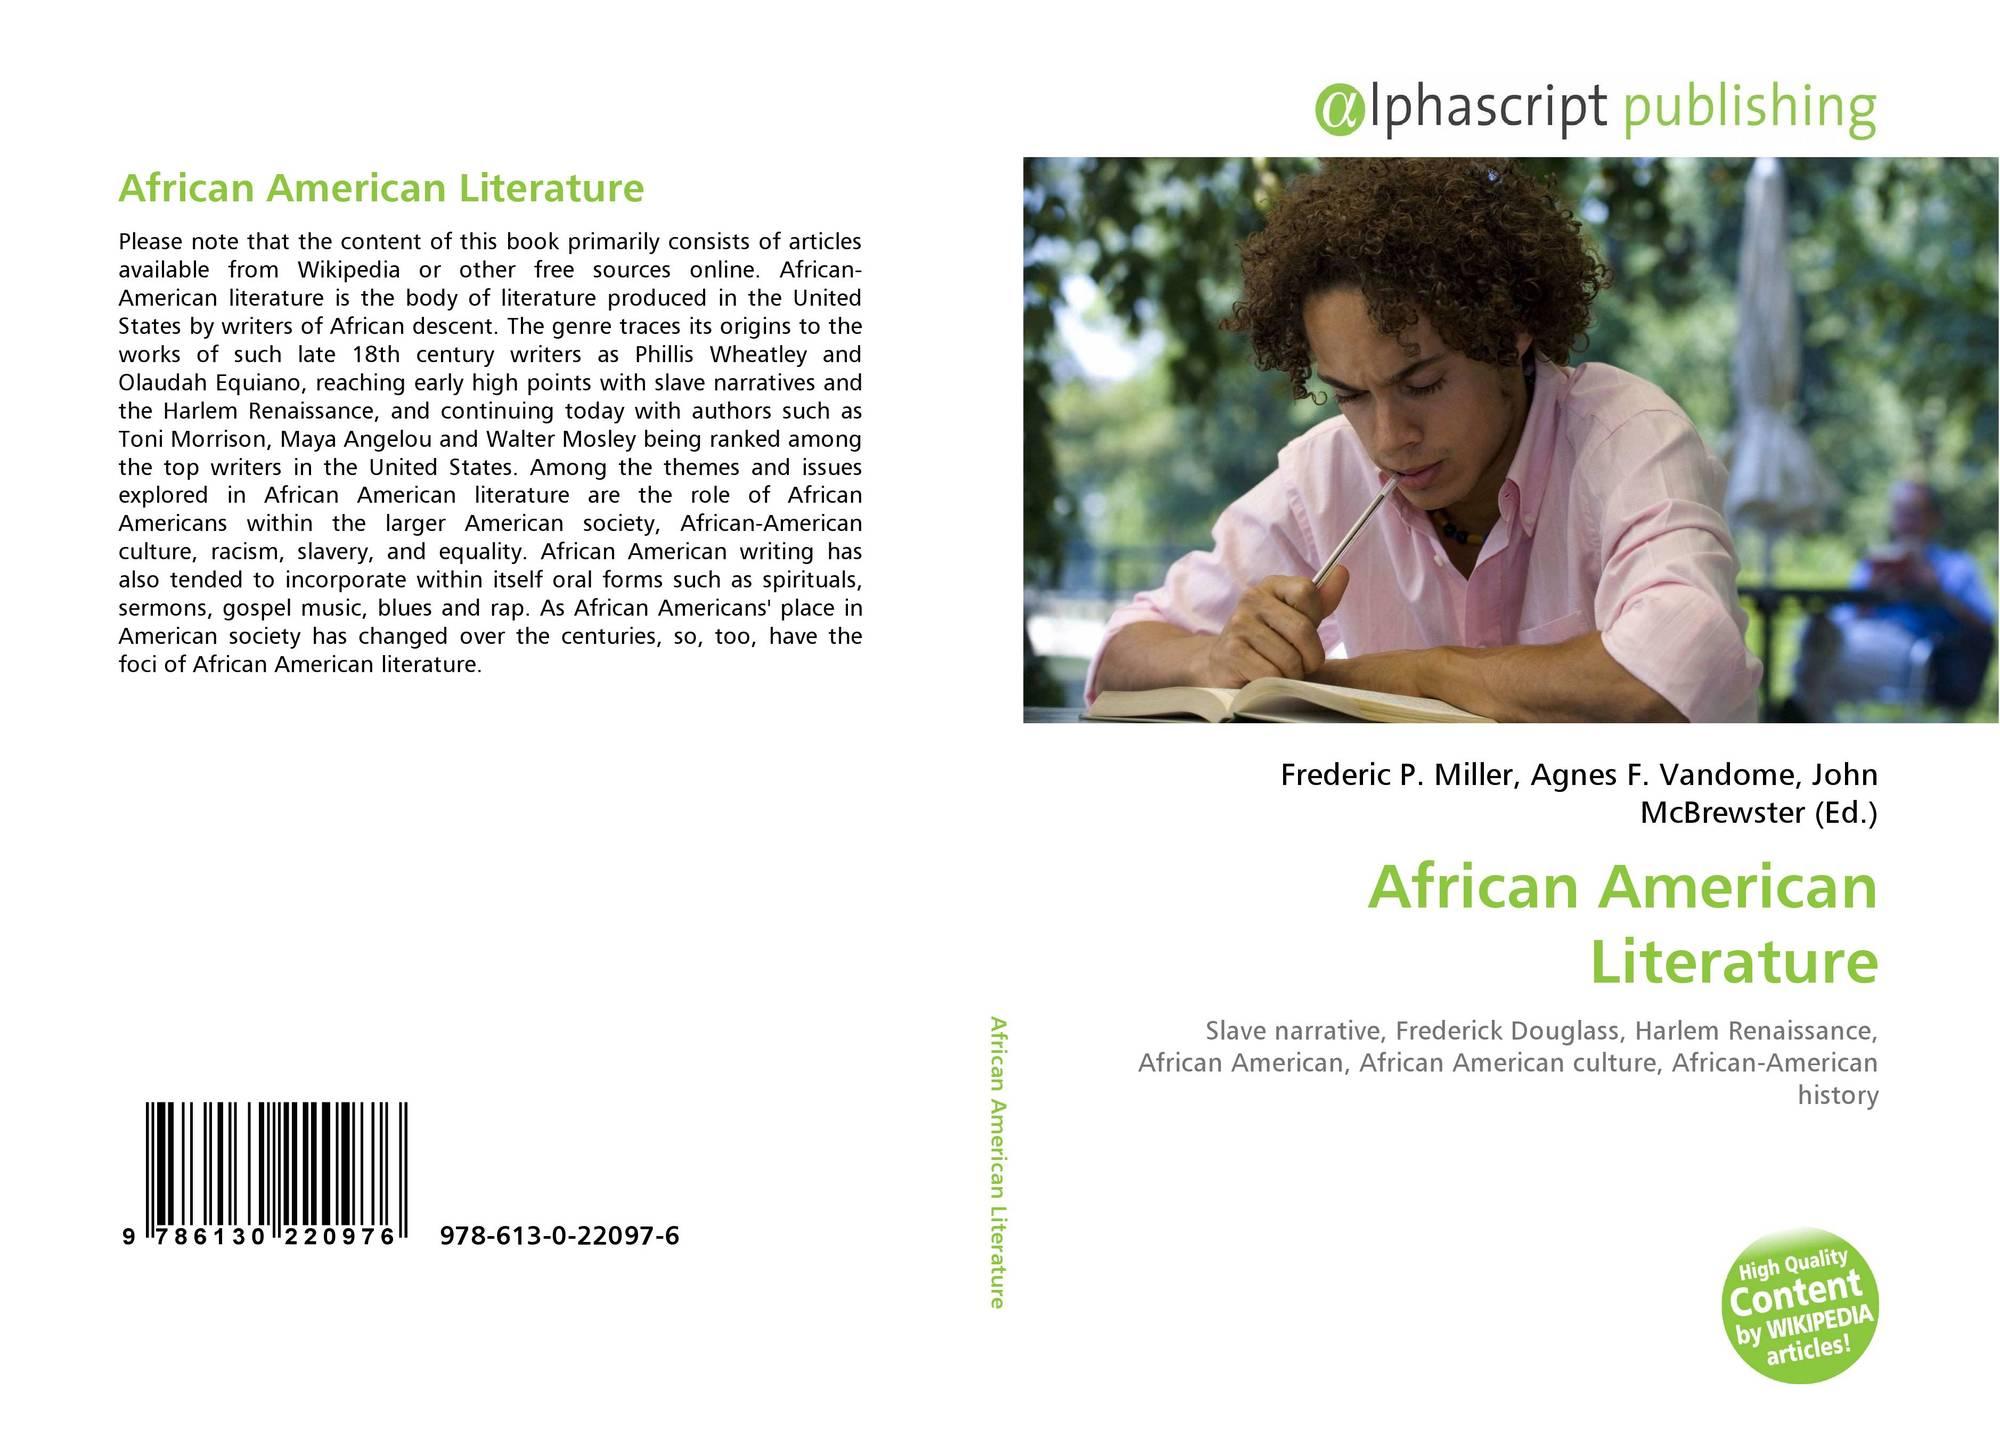 African American Literature, 978-613-0-22097-6, 6130220979